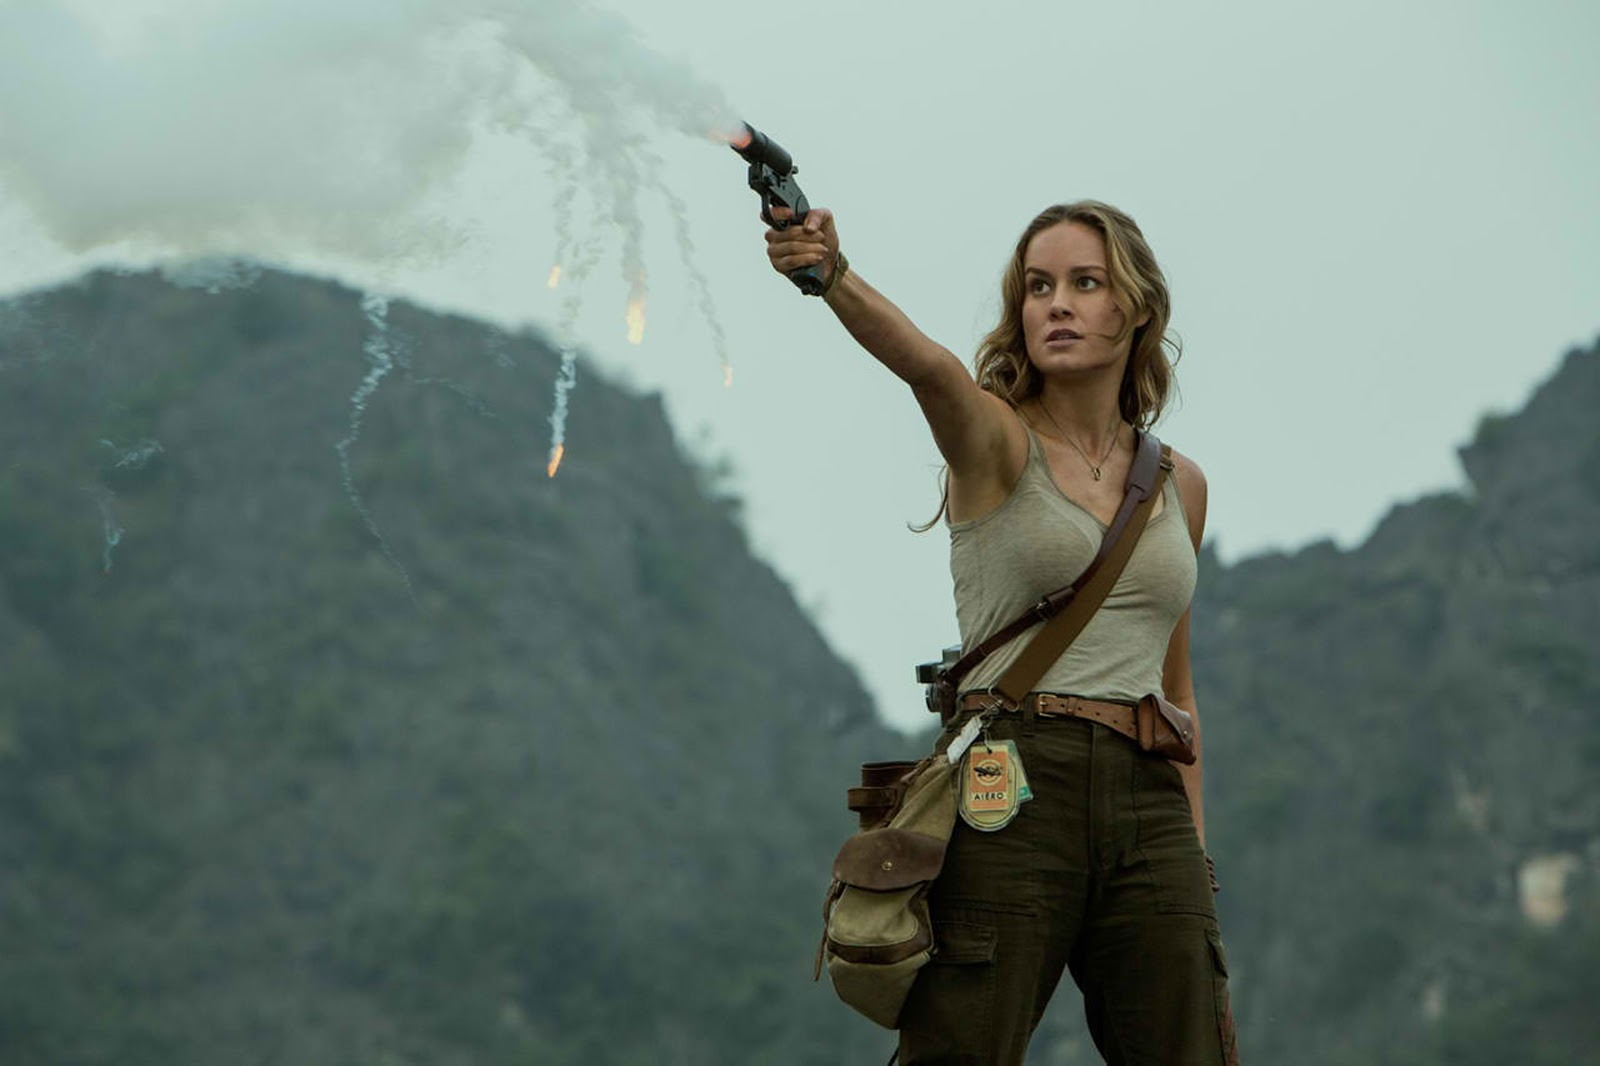 Brie Larson Channels Her Inner Action Hero in \